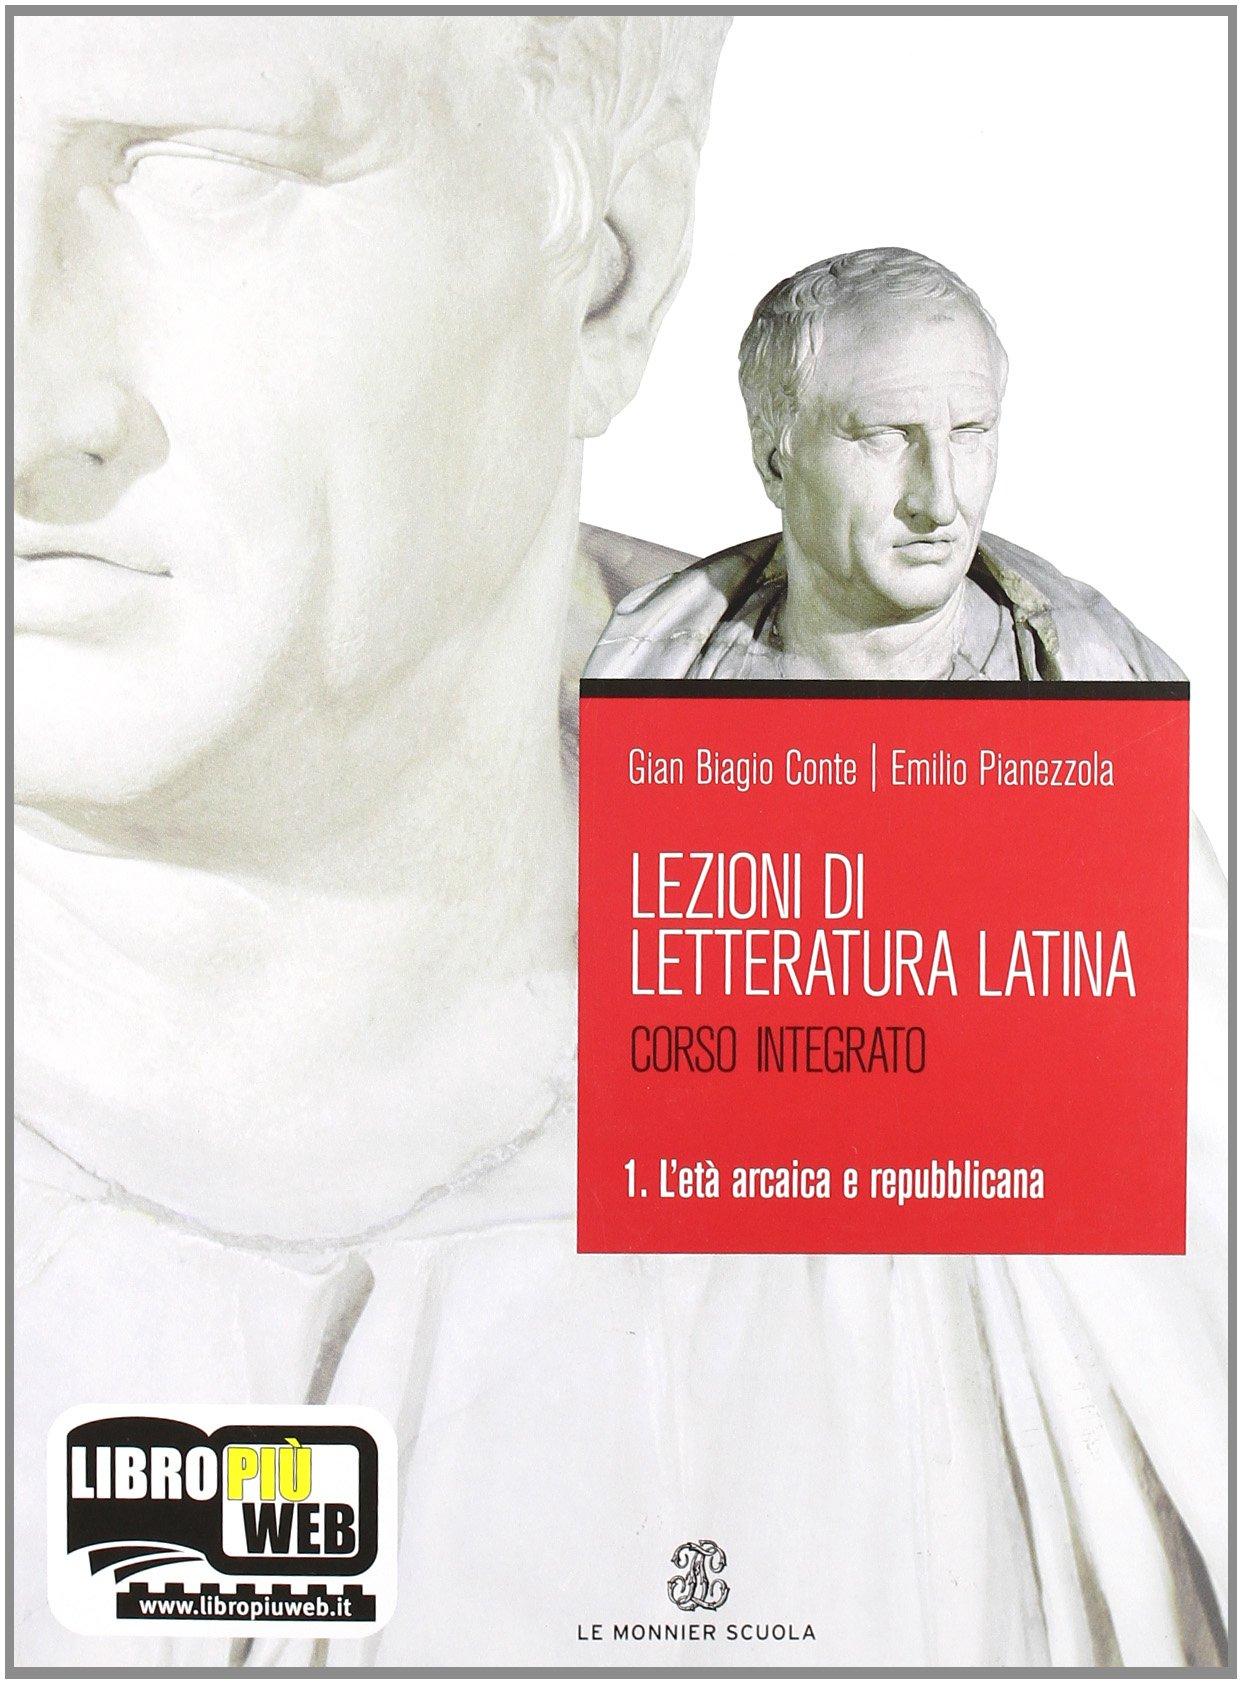 Lezioni di letteratura latina 1. L'età arcaica e republicana